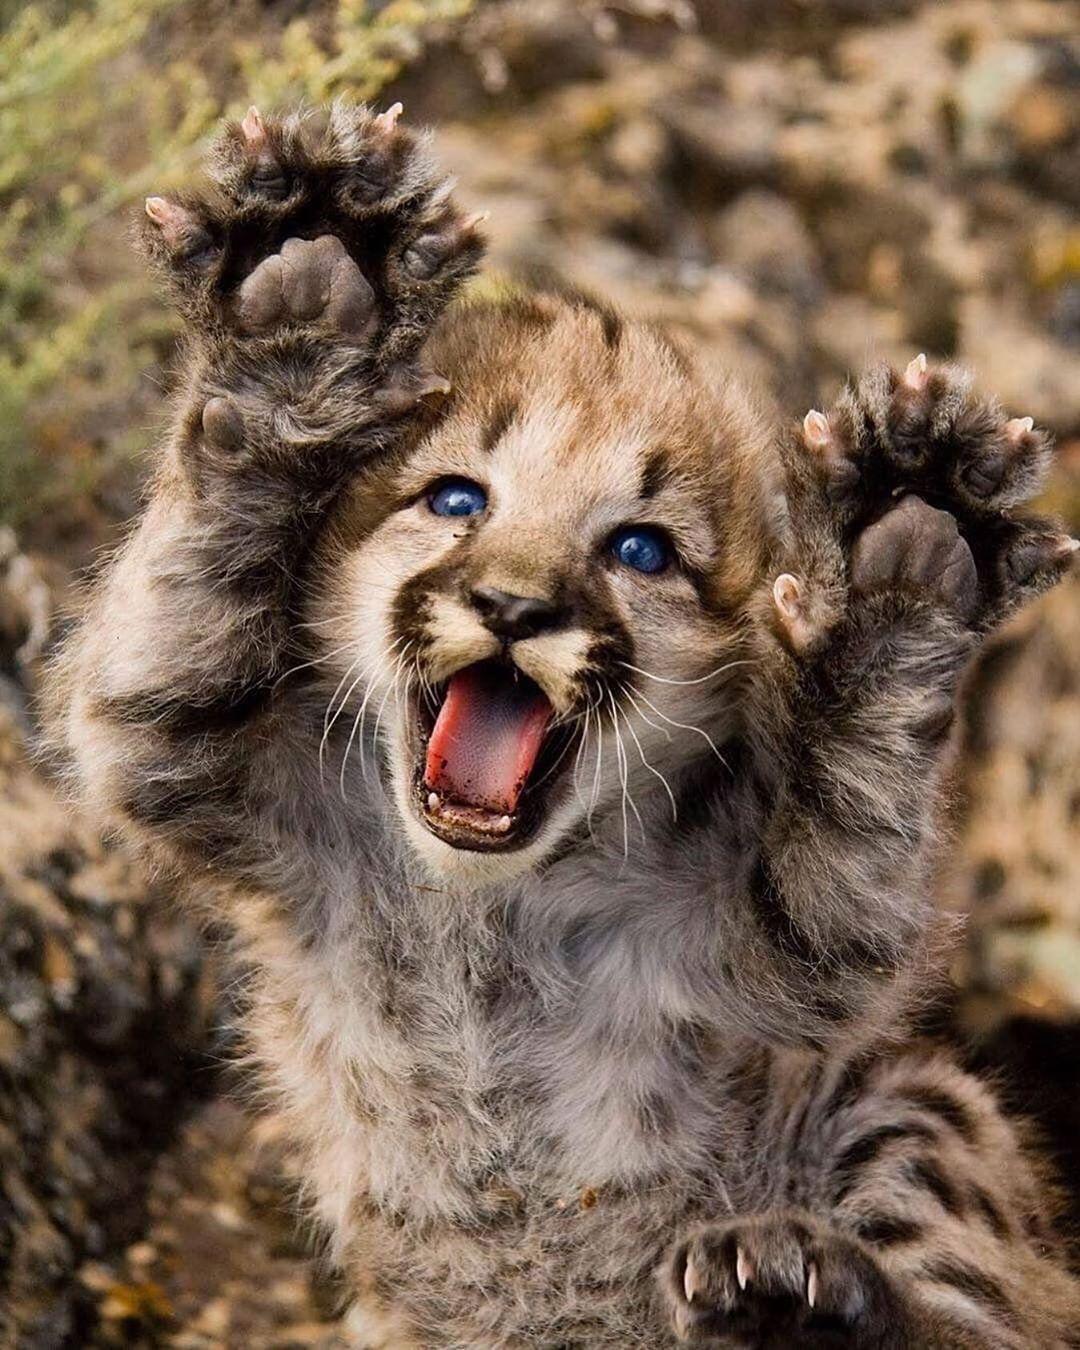 RAWRRR 🐾 Did I scare you? 😱 Big cat populations are